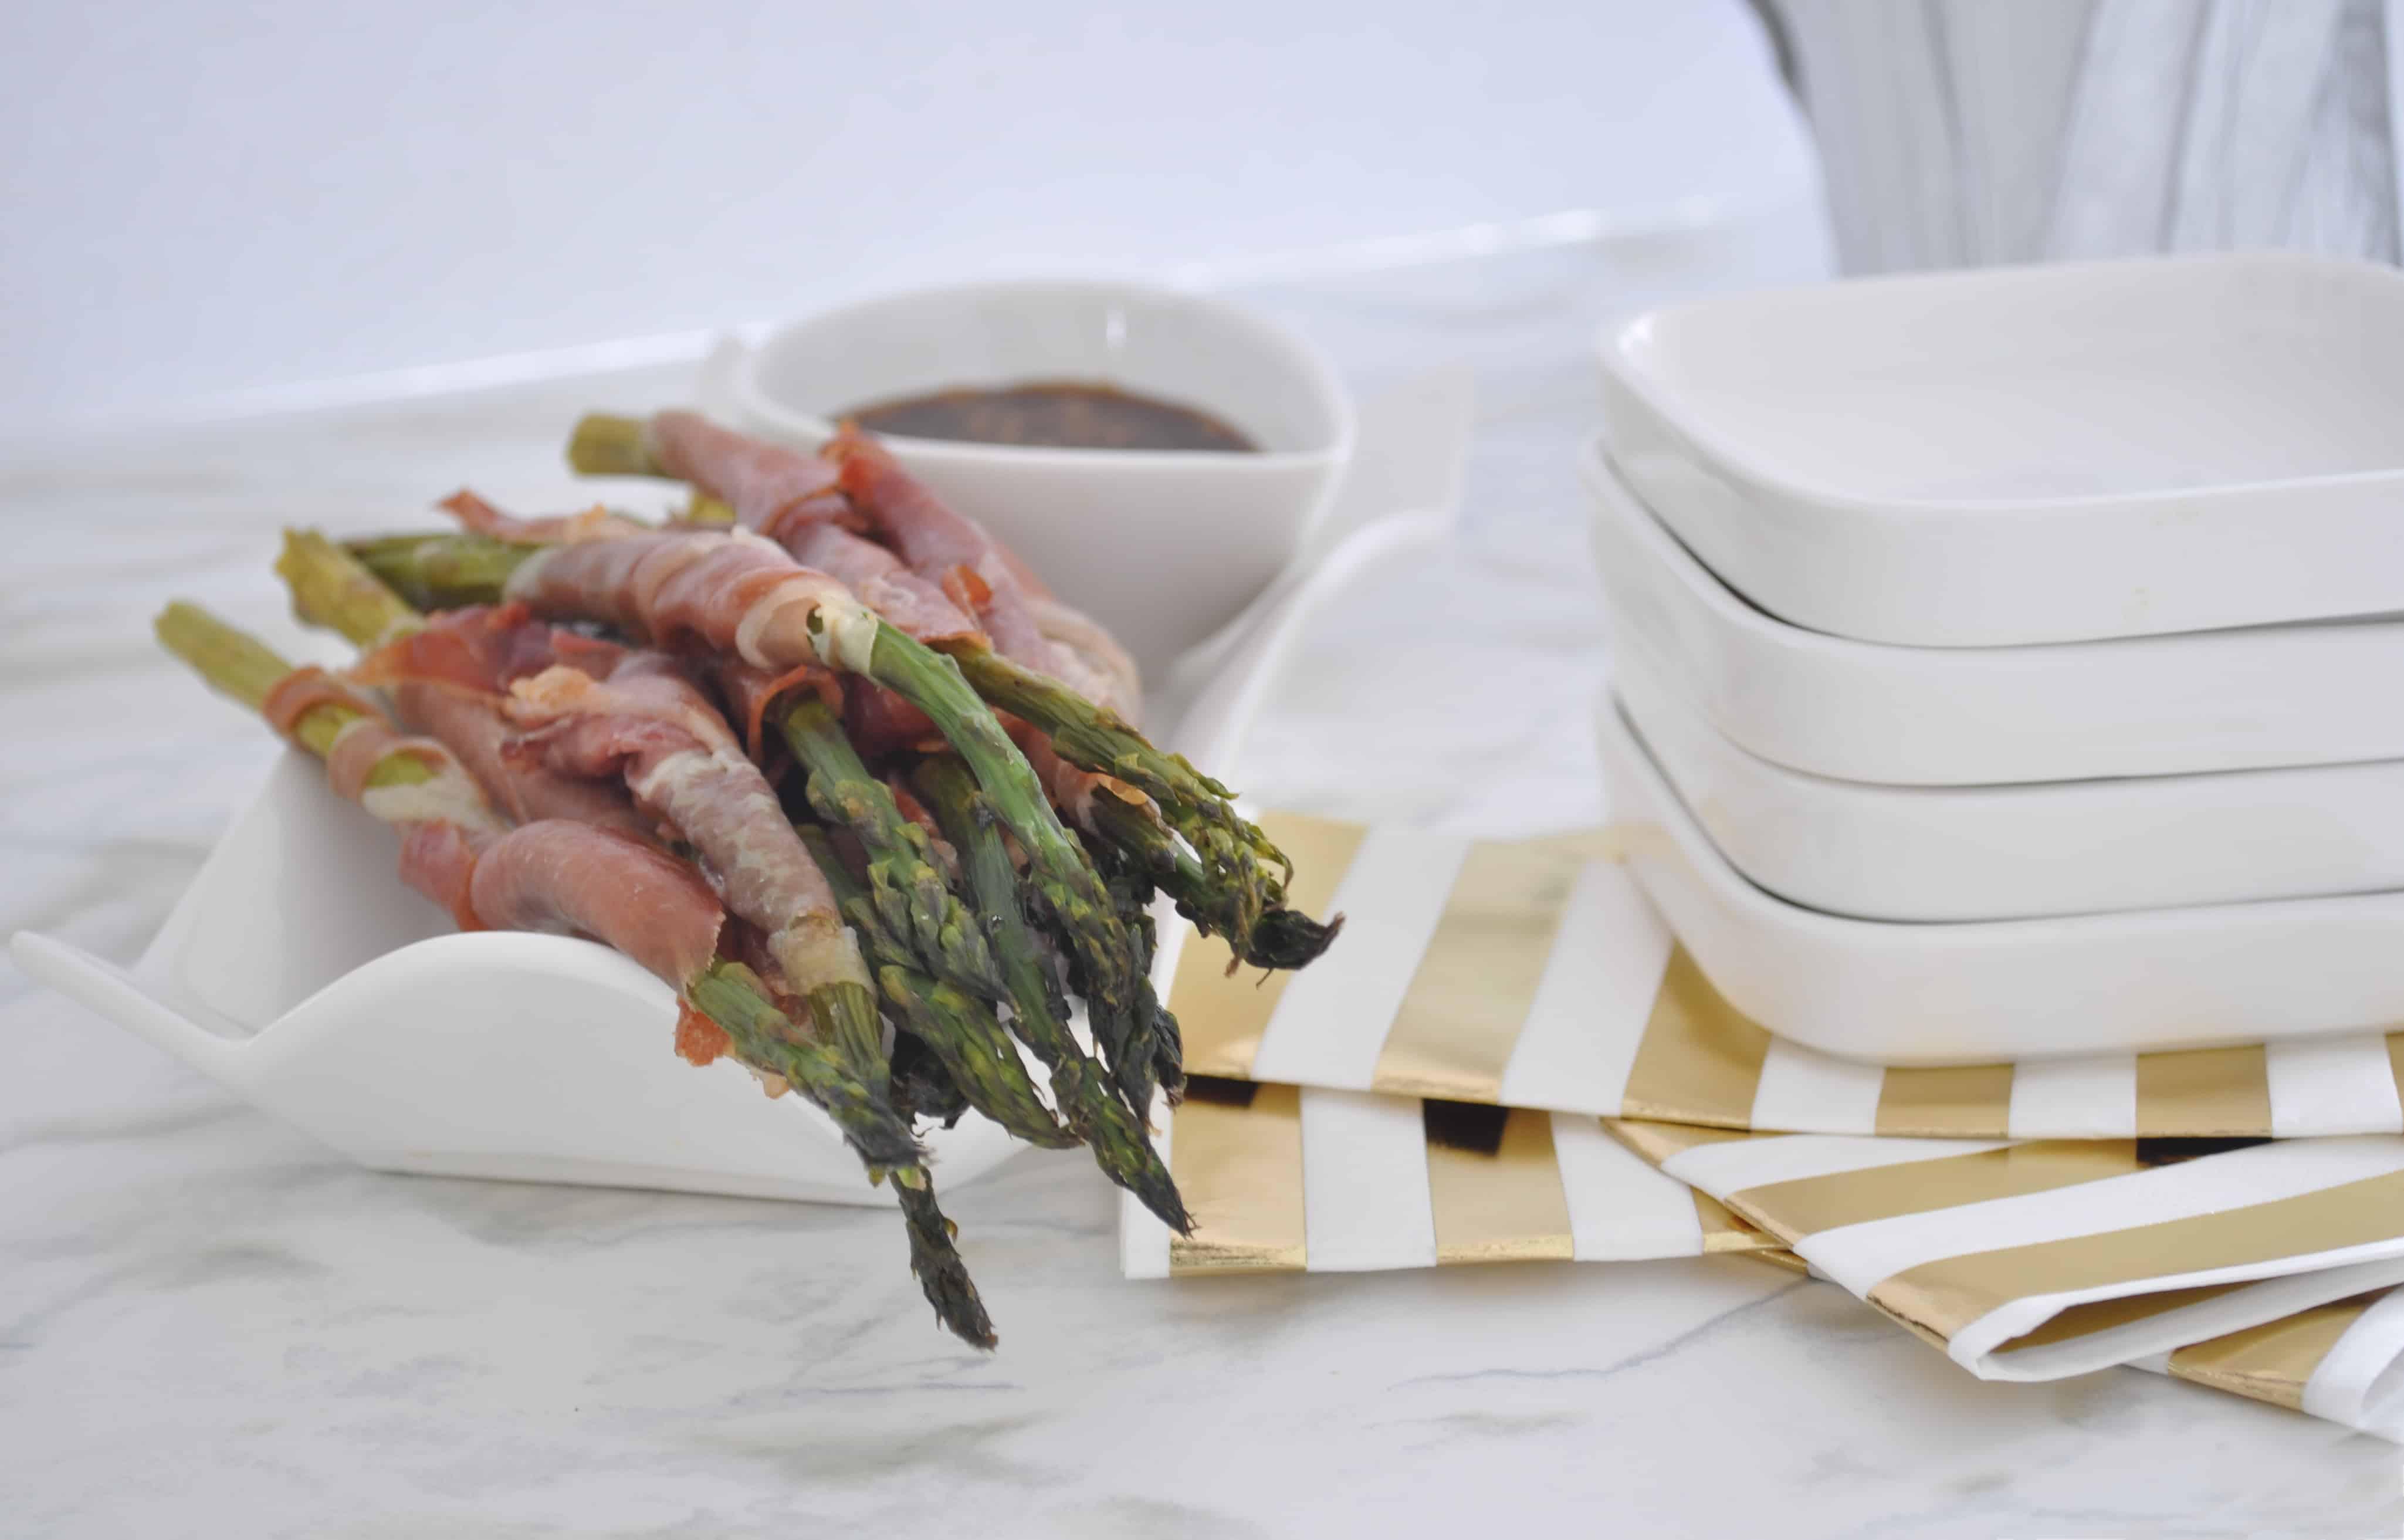 Prosciutto Wrapped Asaparagus